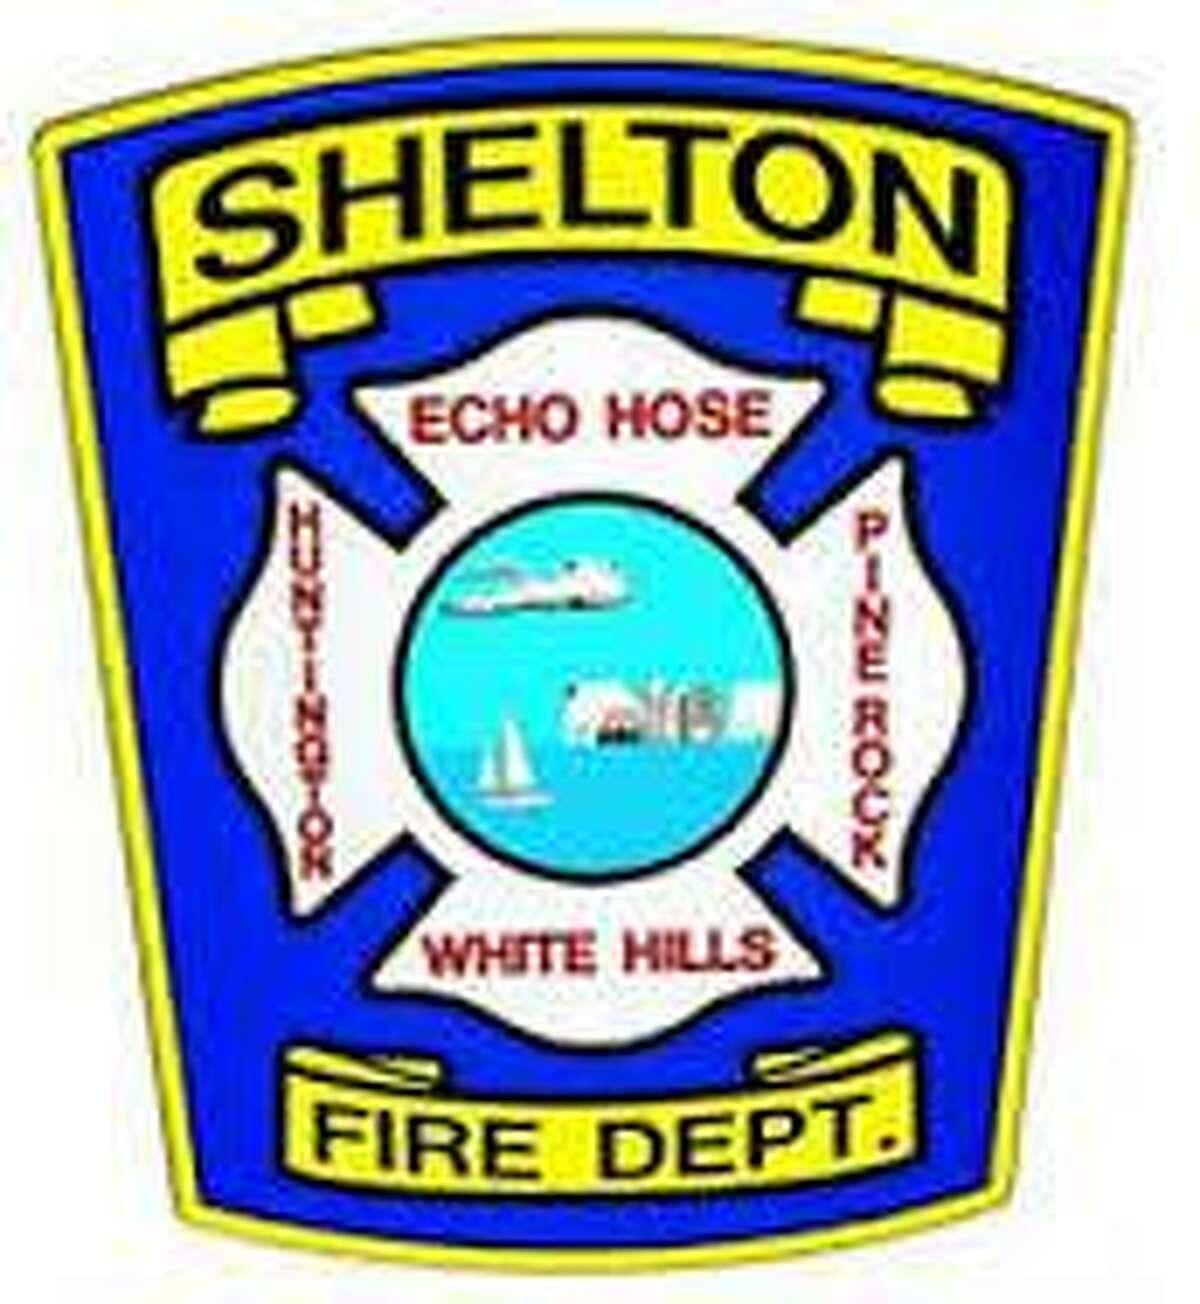 Shelton Fire Department